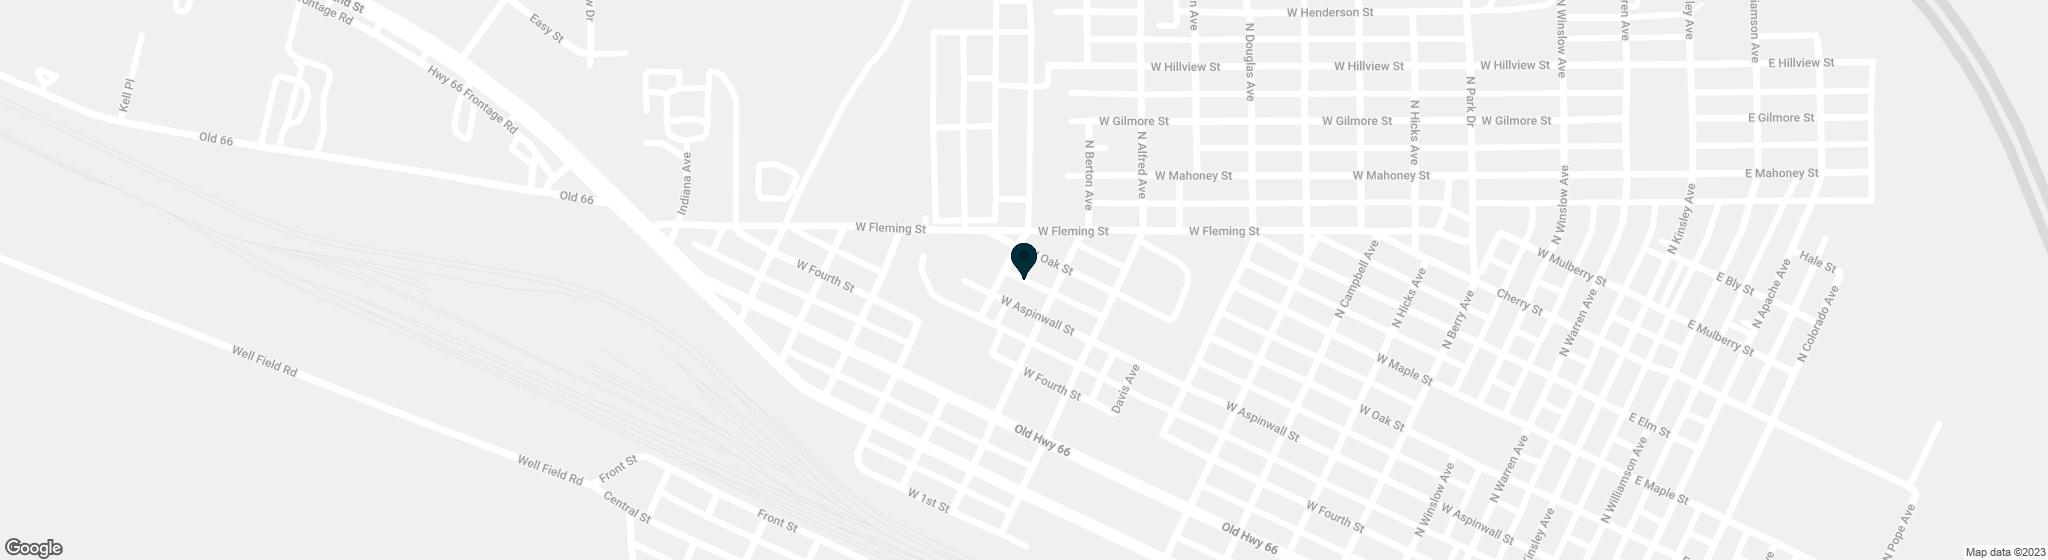 6020 RIVER RUN Drive 374 Winslow AZ 86047